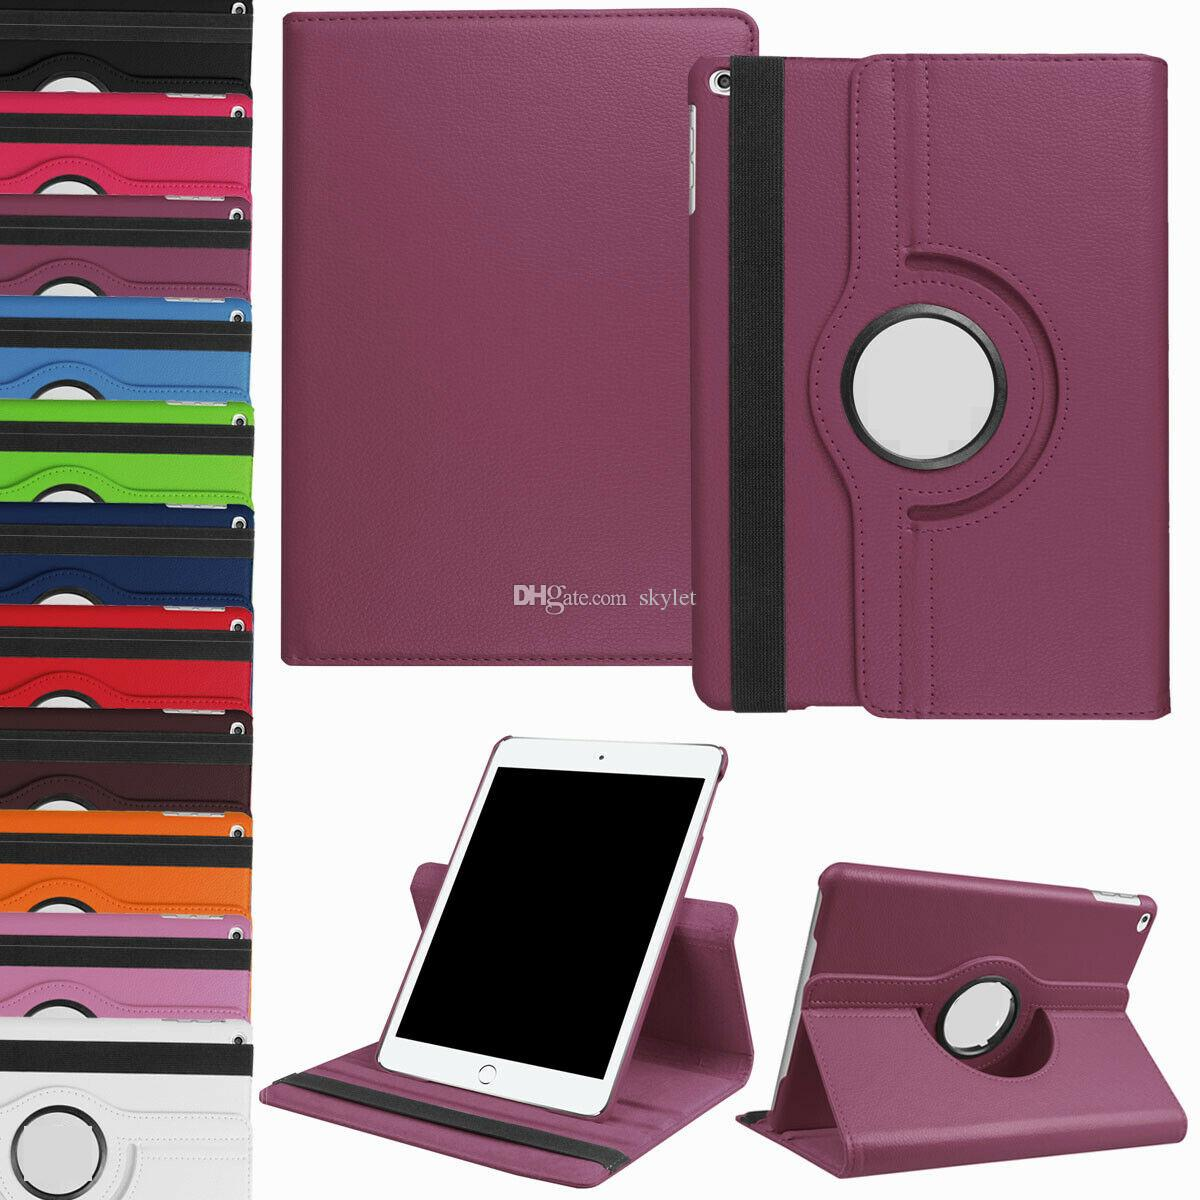 Flip Cover Case For iPad 10.2 iPad Mini 4/5 2019 Tablet Case for Samsung TAB A10.1 T515 T720 T290 Huawei T3 M2 M5 M6 with OPP Bag